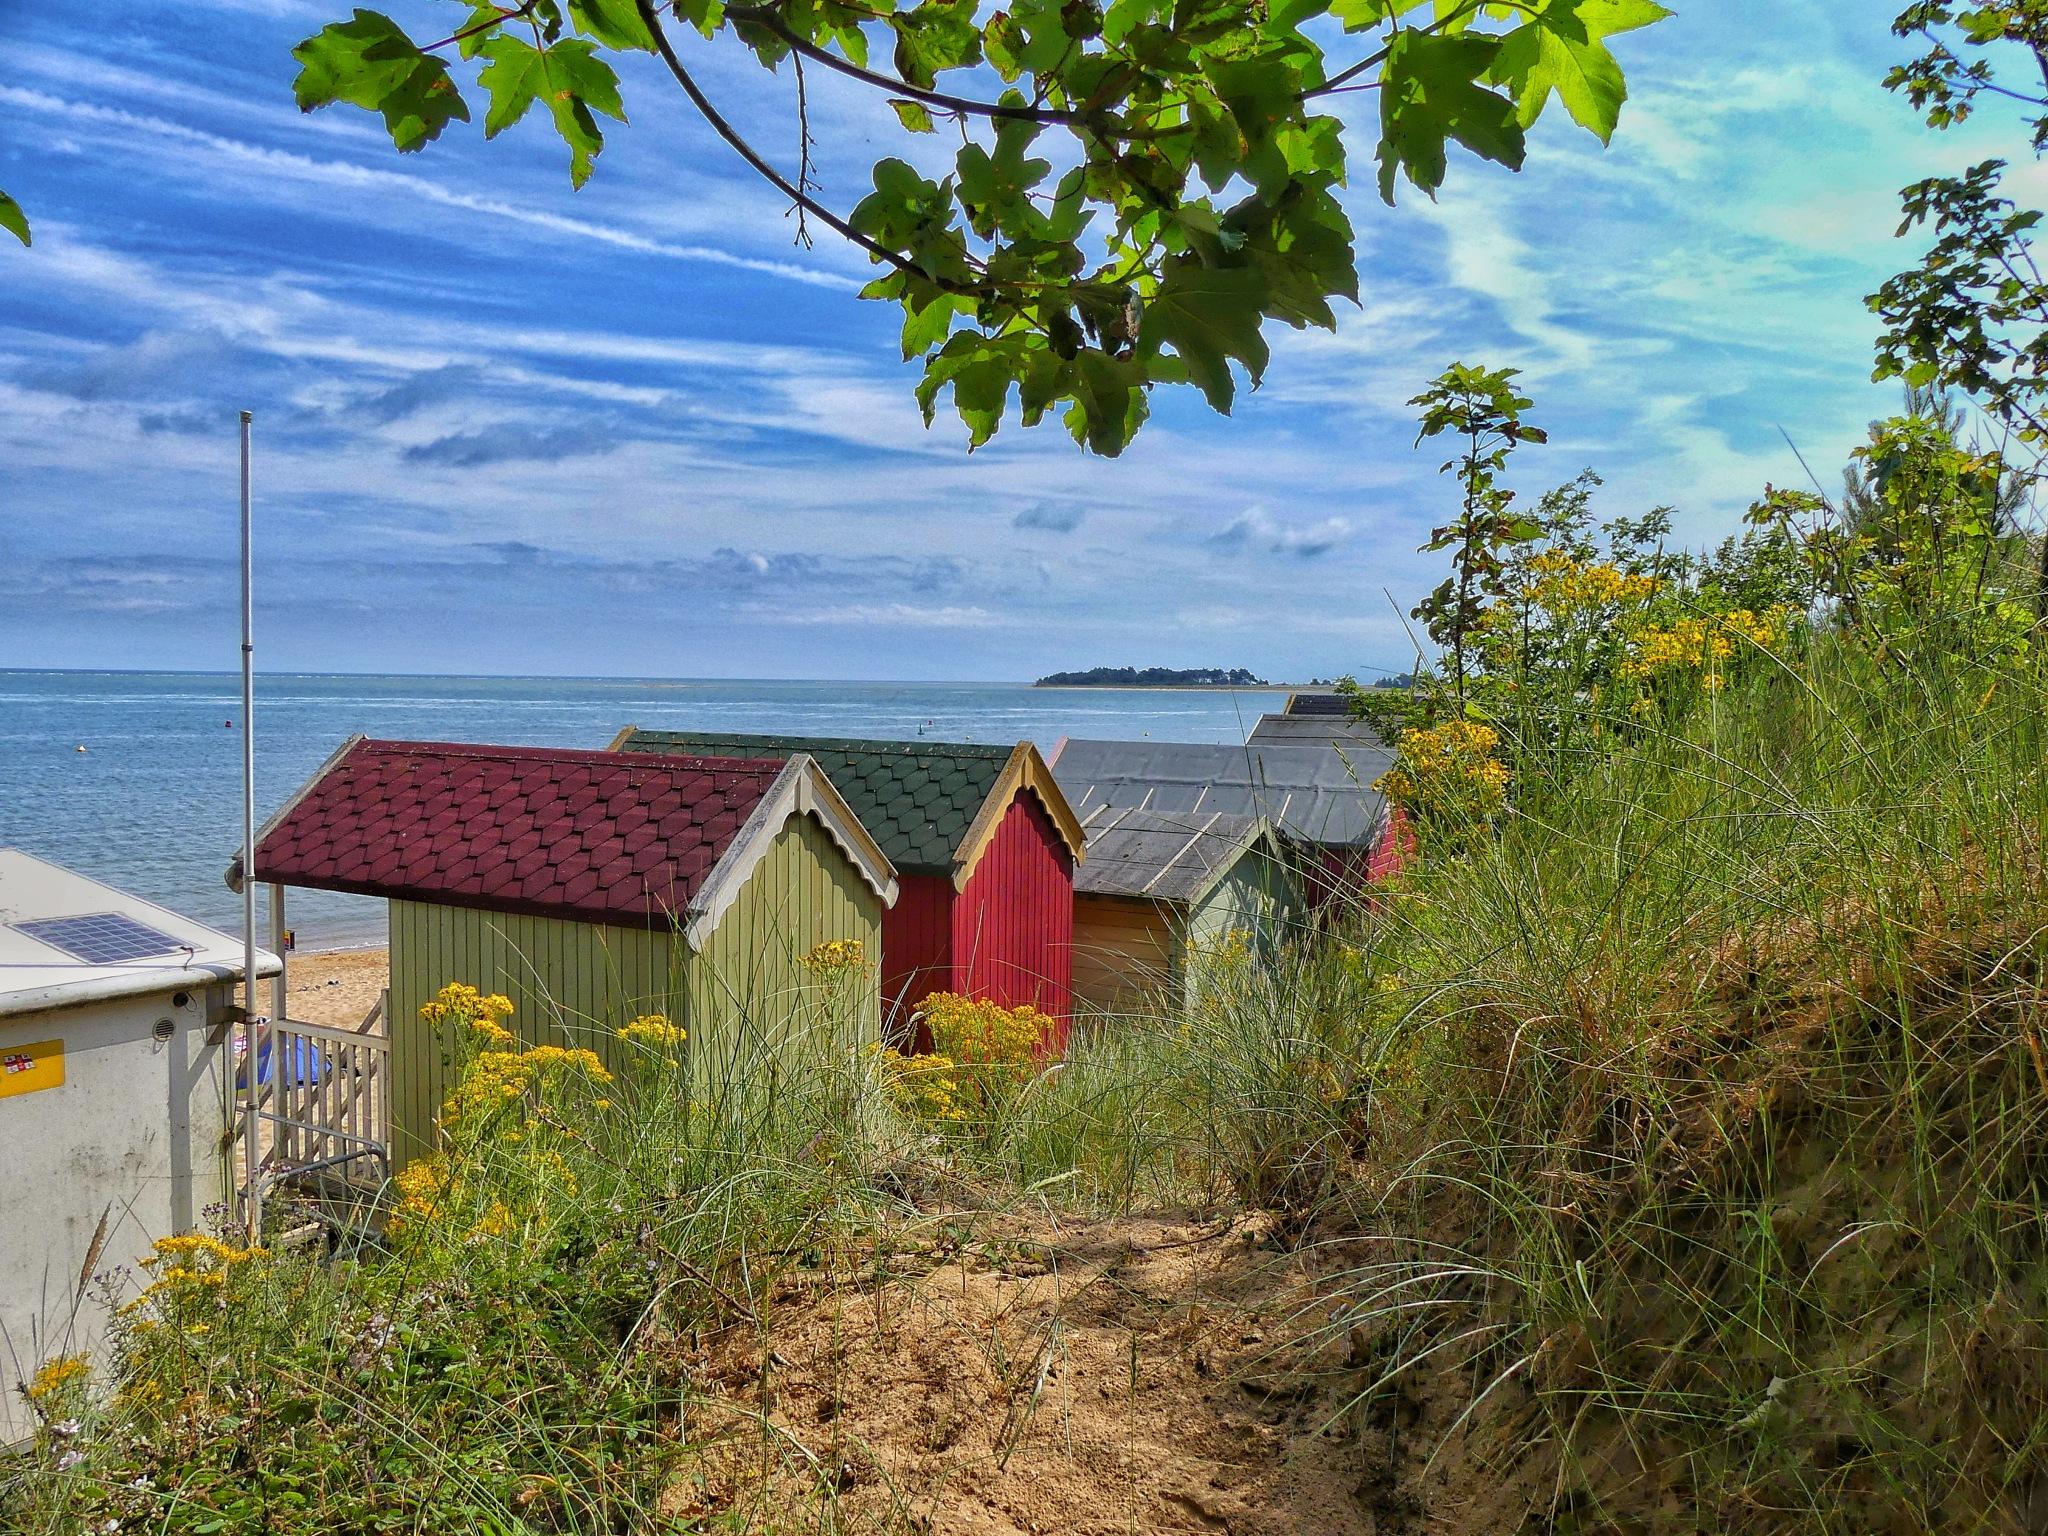 Wells-next-the-sea beach hut. by David Starkey